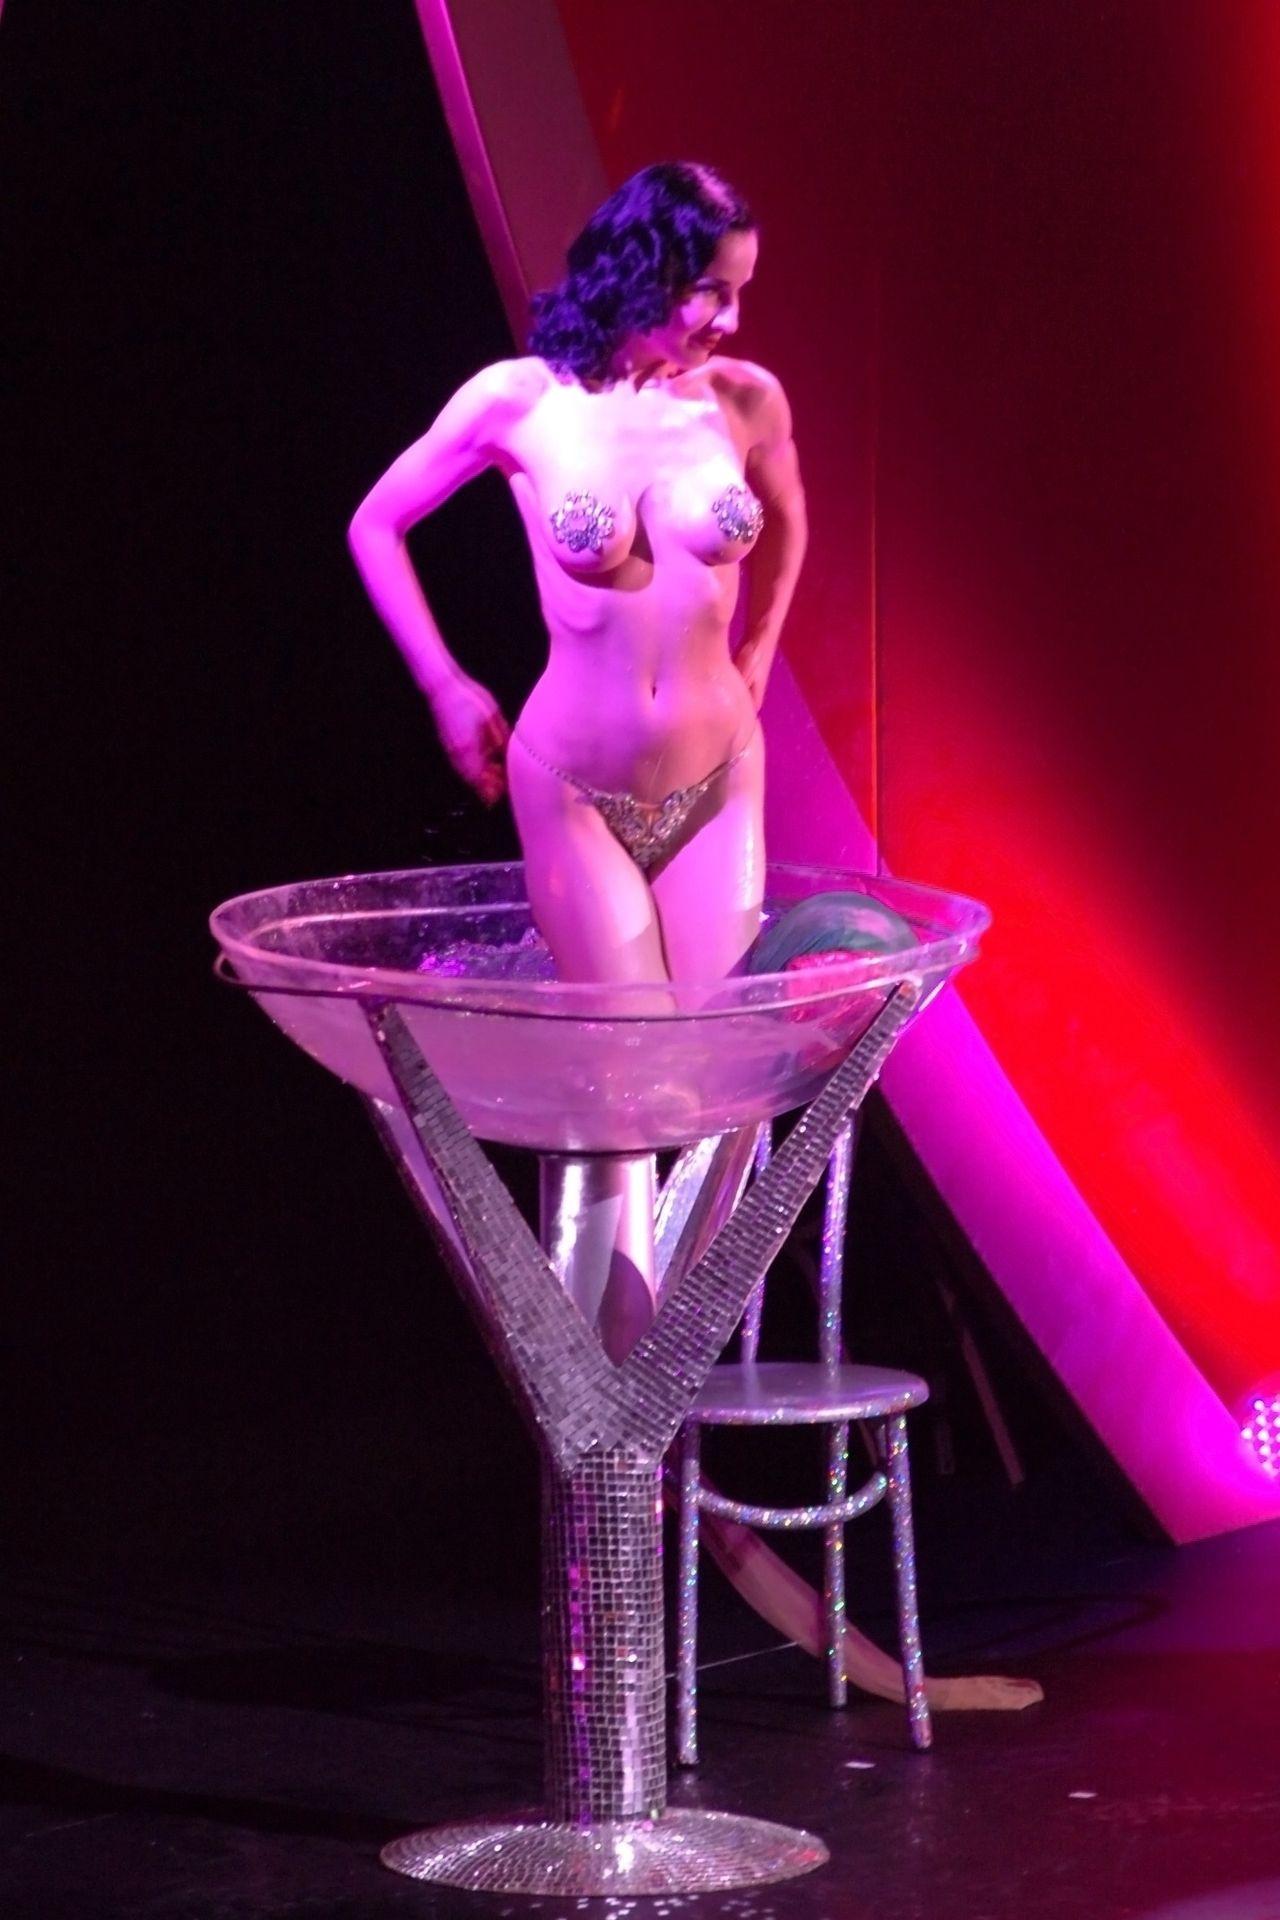 Dita Von Teese Performs At Erotica 06 In London 0029